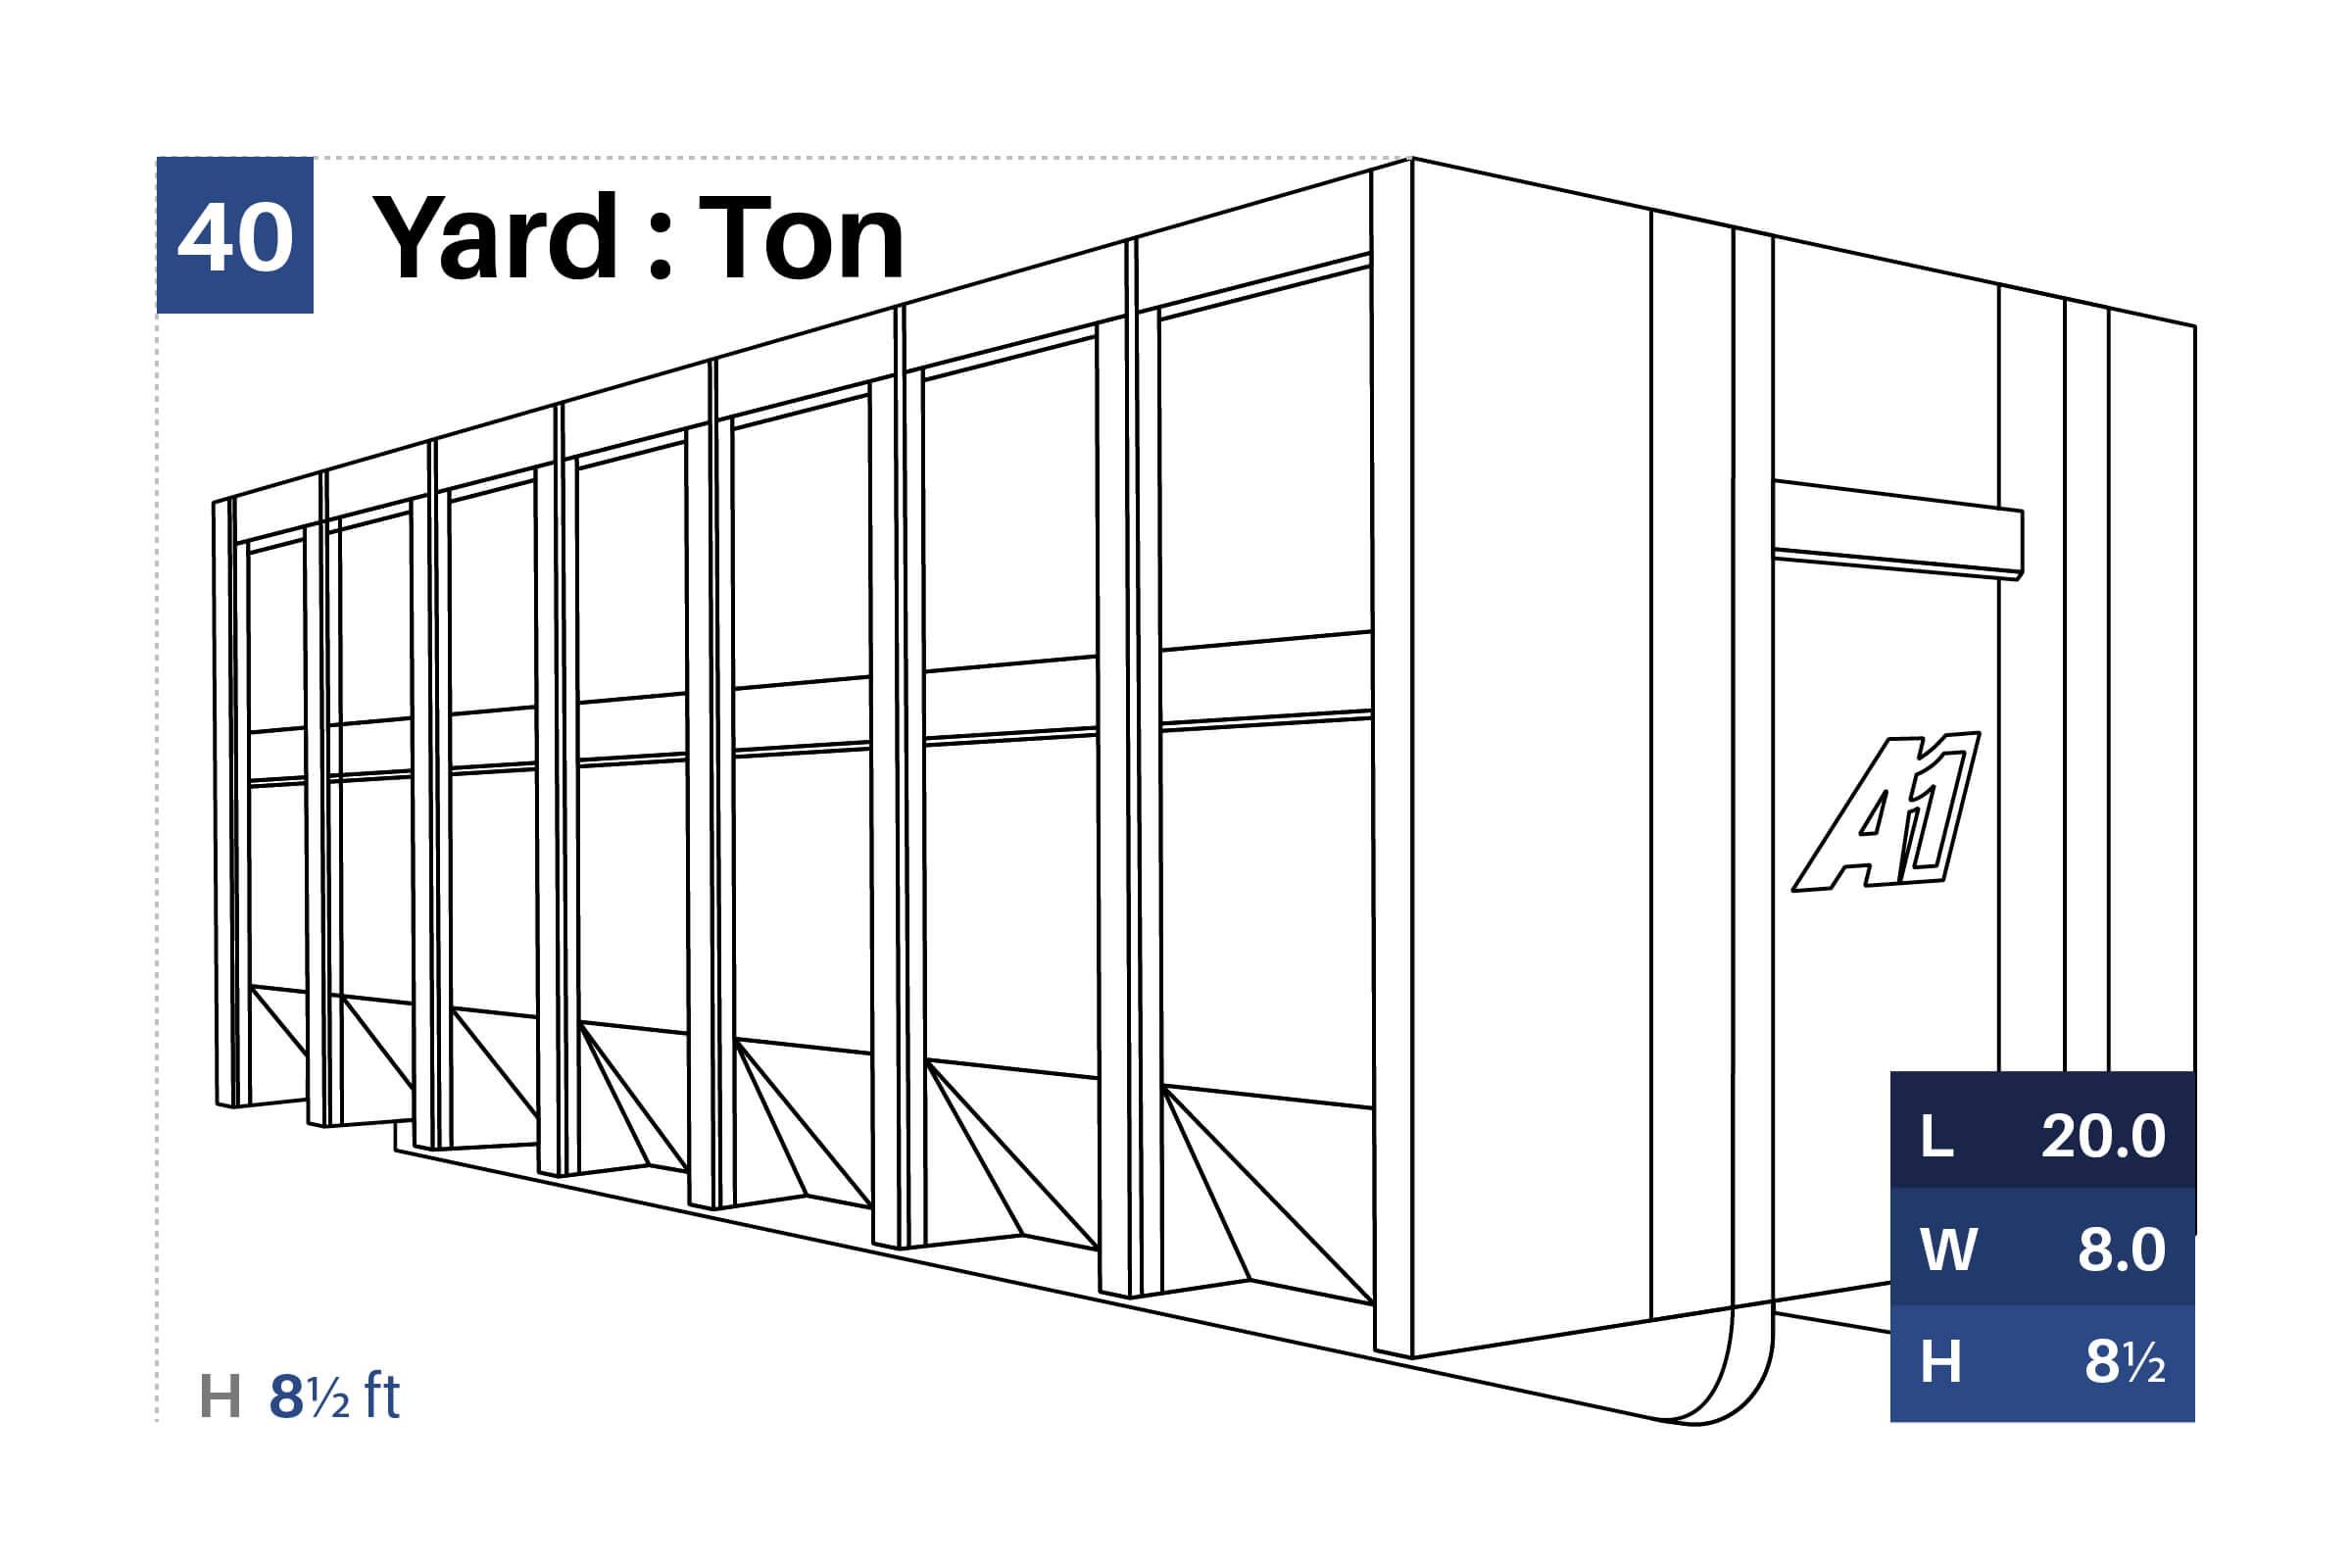 a1skip-hire-40yard